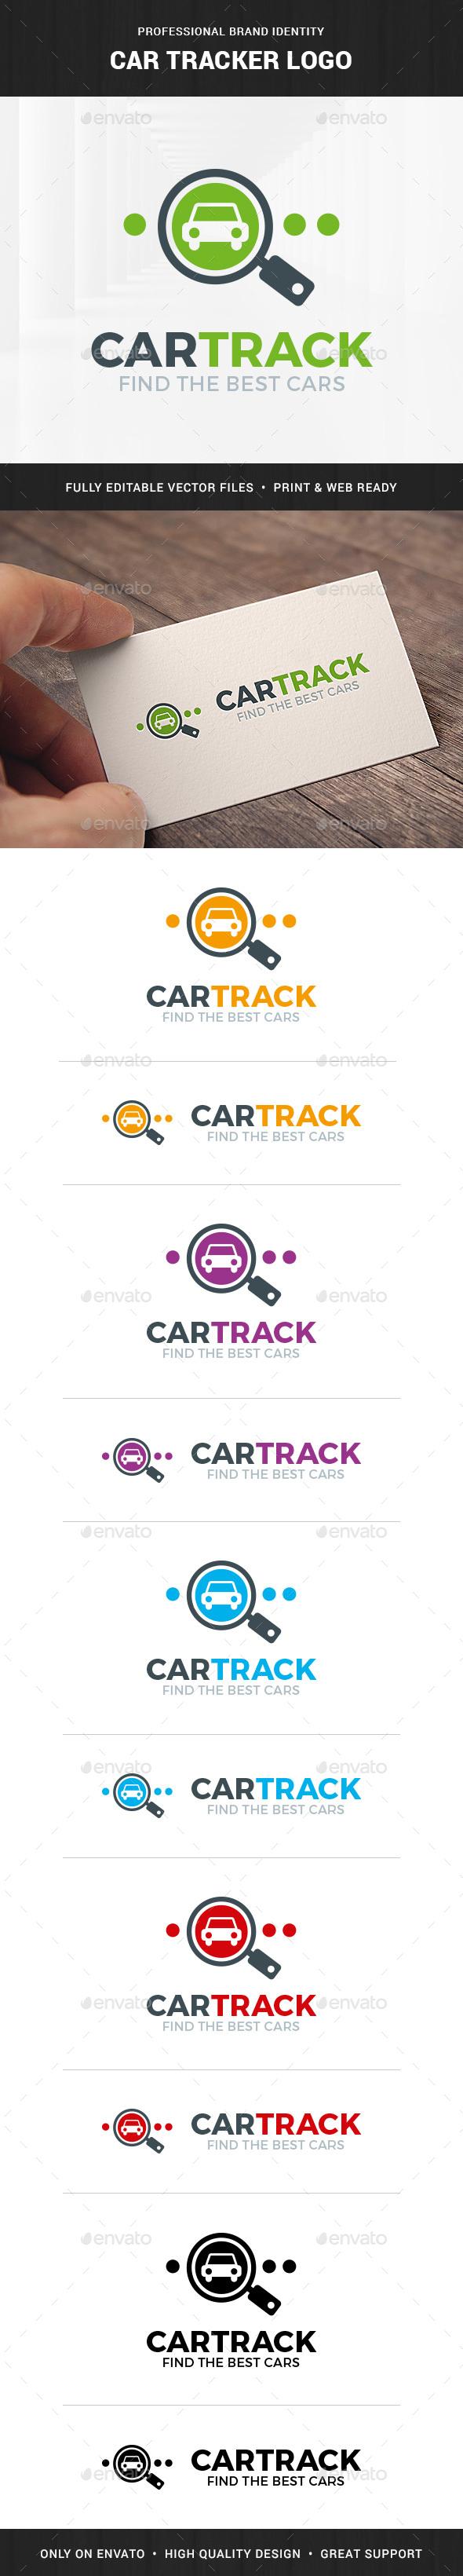 Car Tracker Logo Template